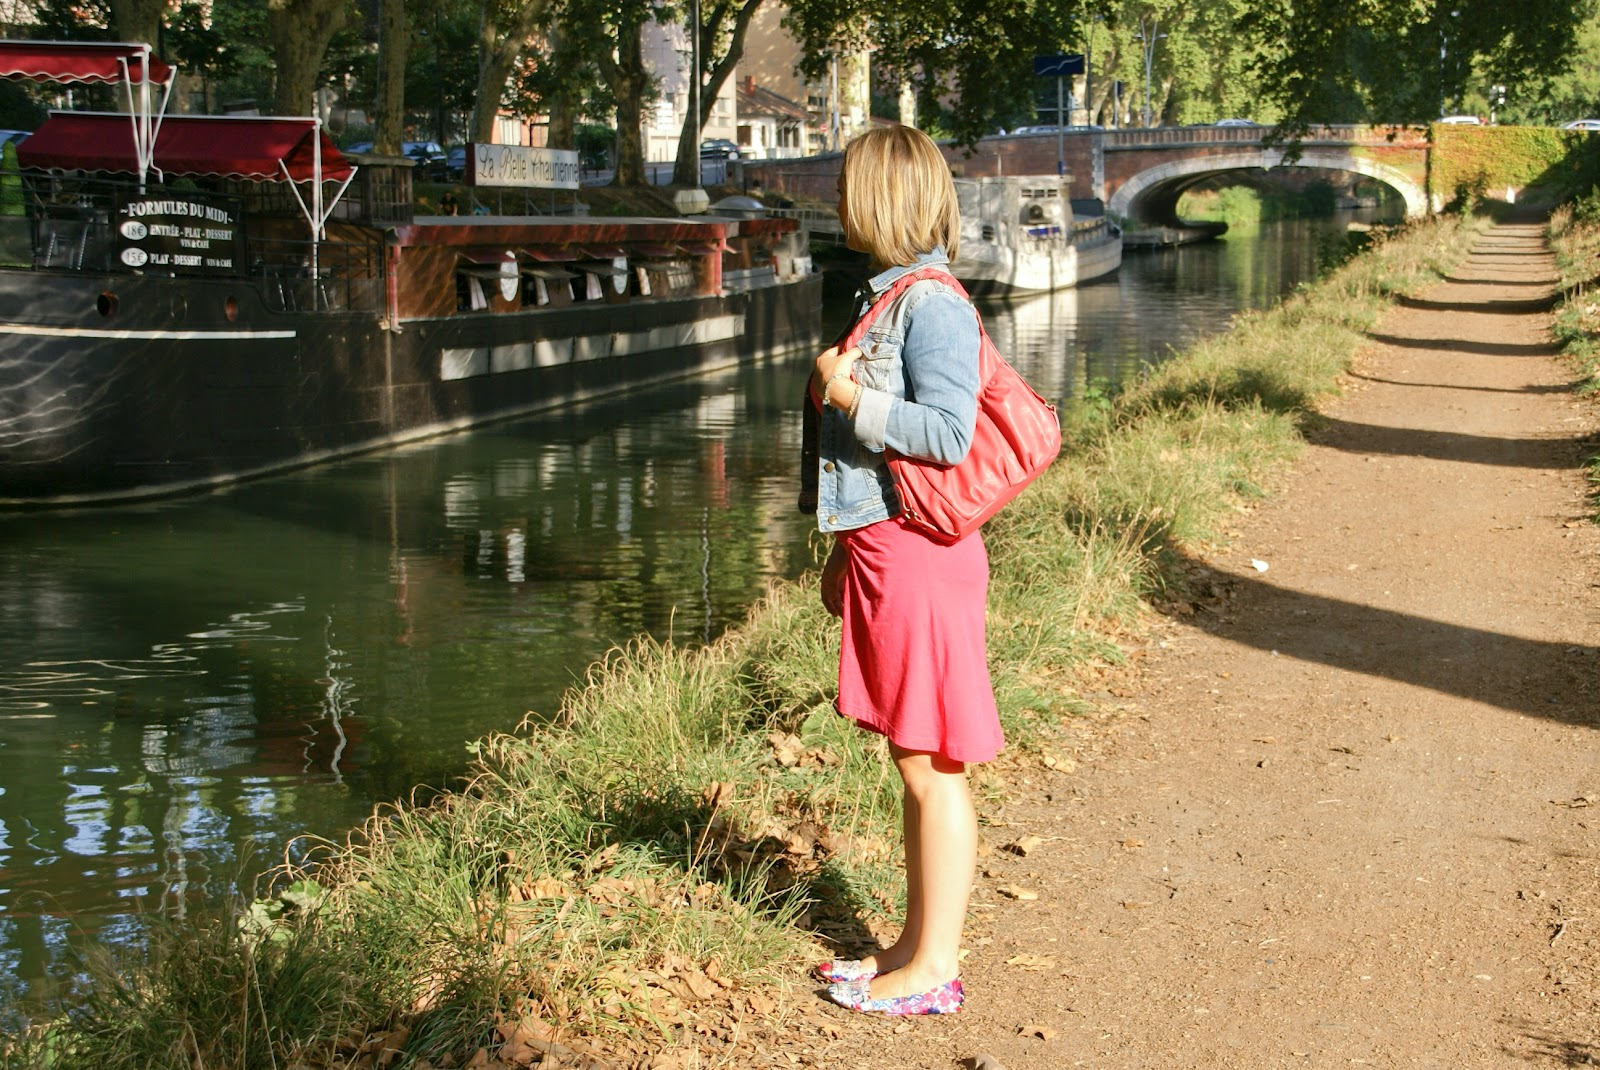 The audas'world: Ma petite robe rouge et moi